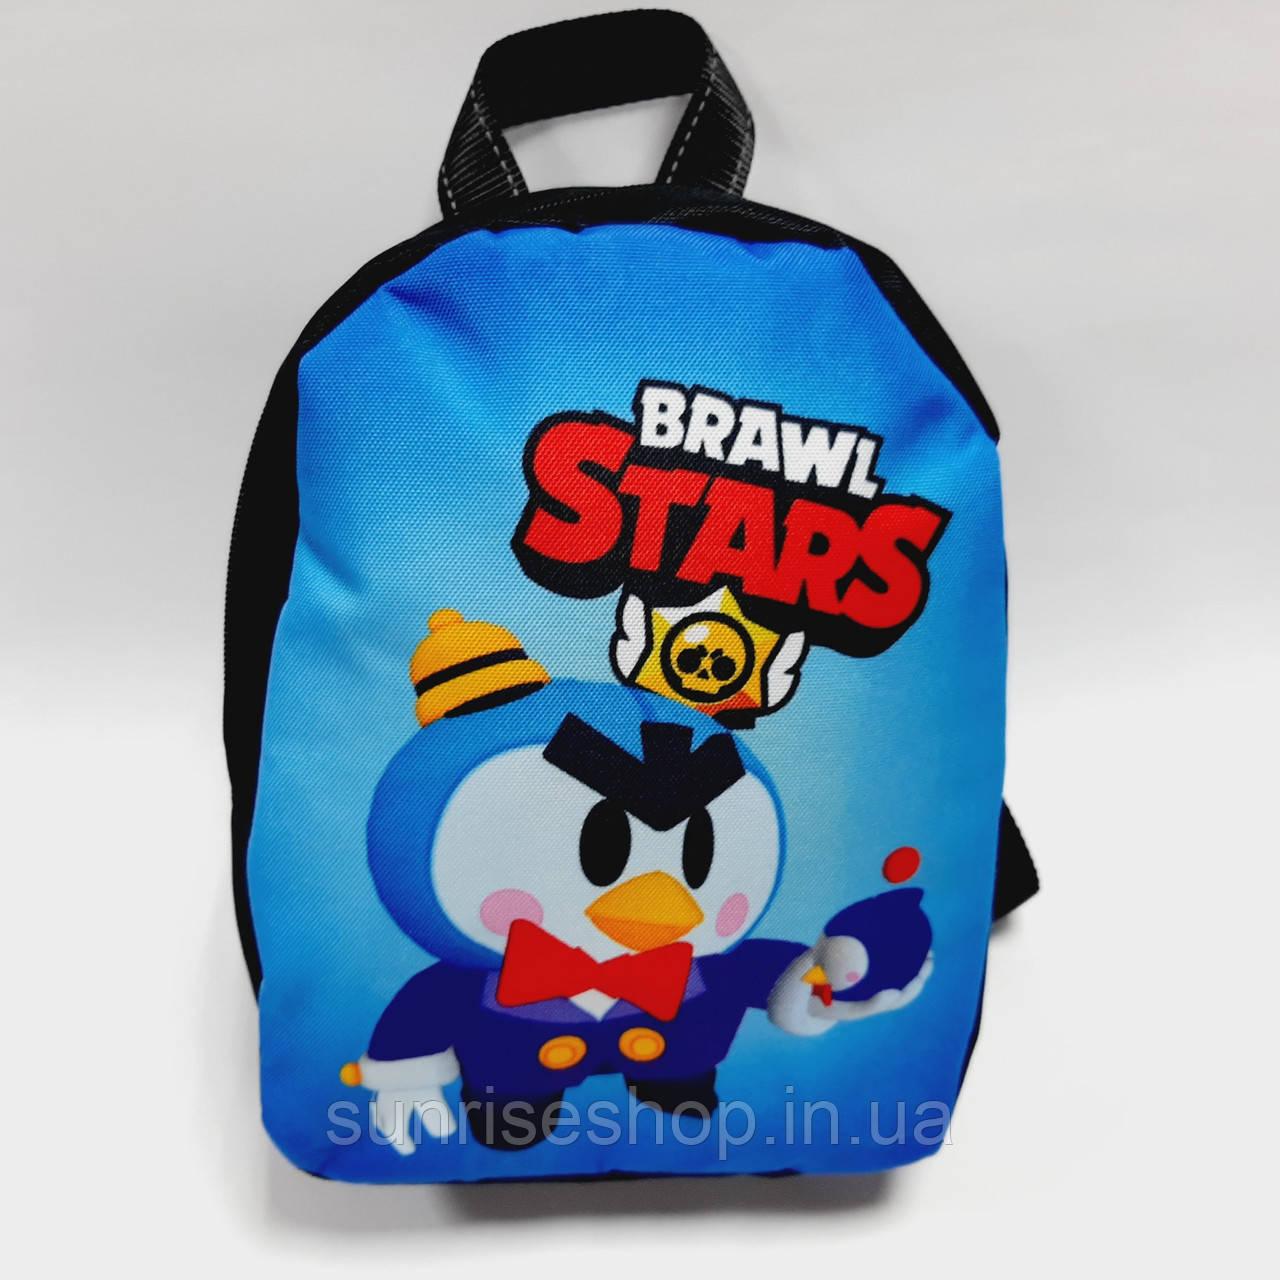 Рюкзак дитячий для хлопчика купити оптом